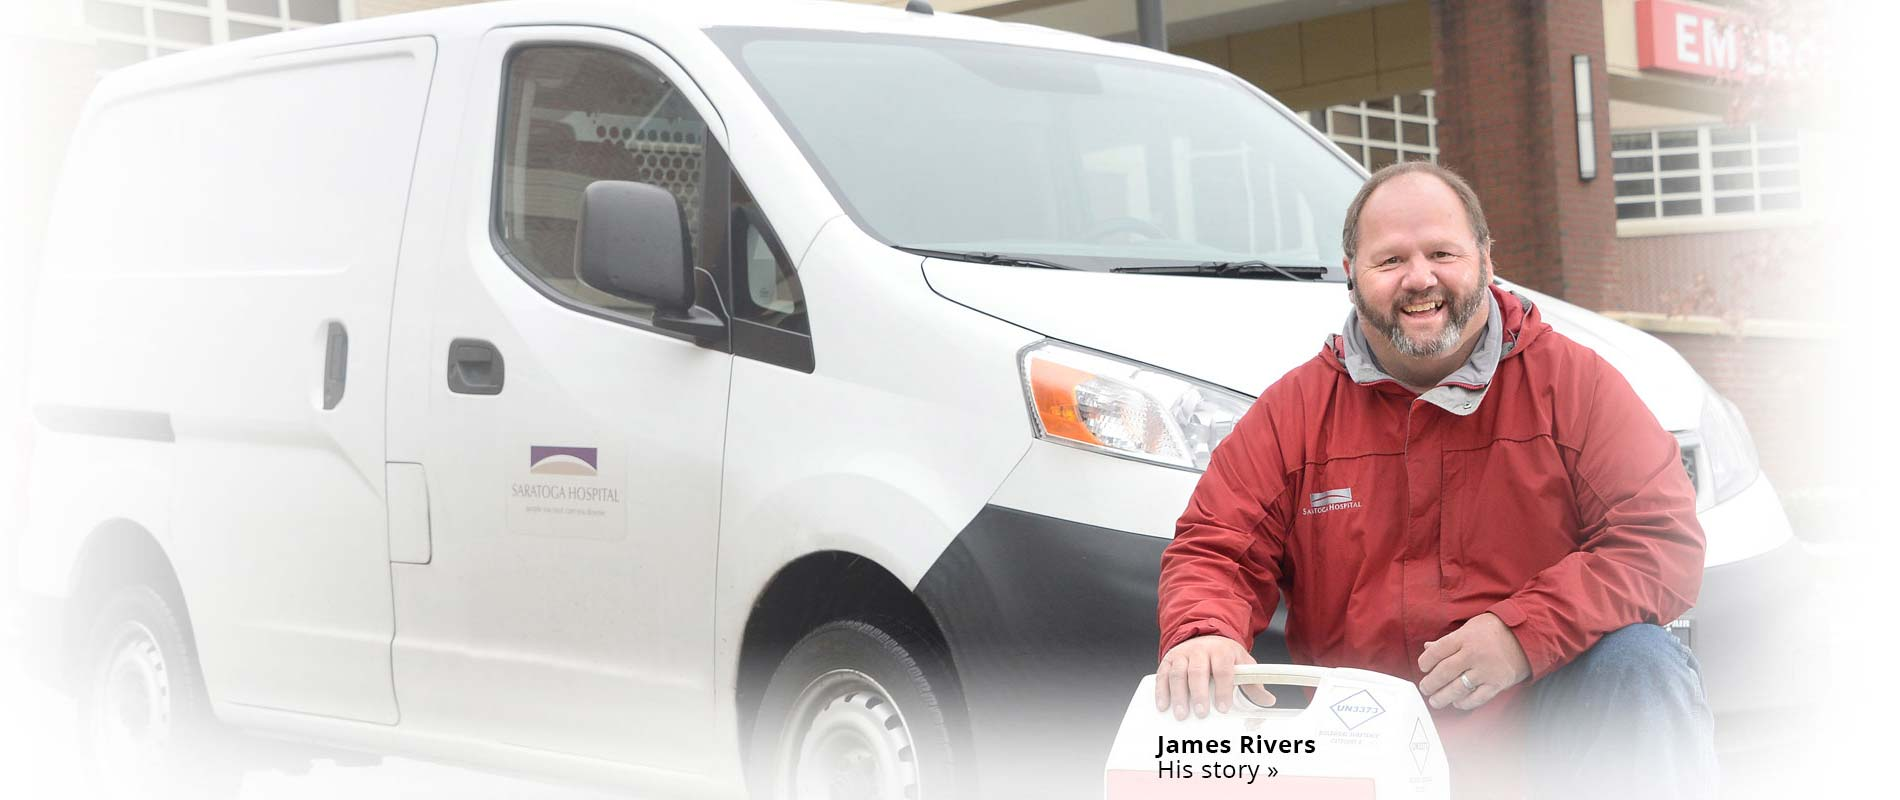 James Rivers kneeling by van in front of Saratoga Hospital